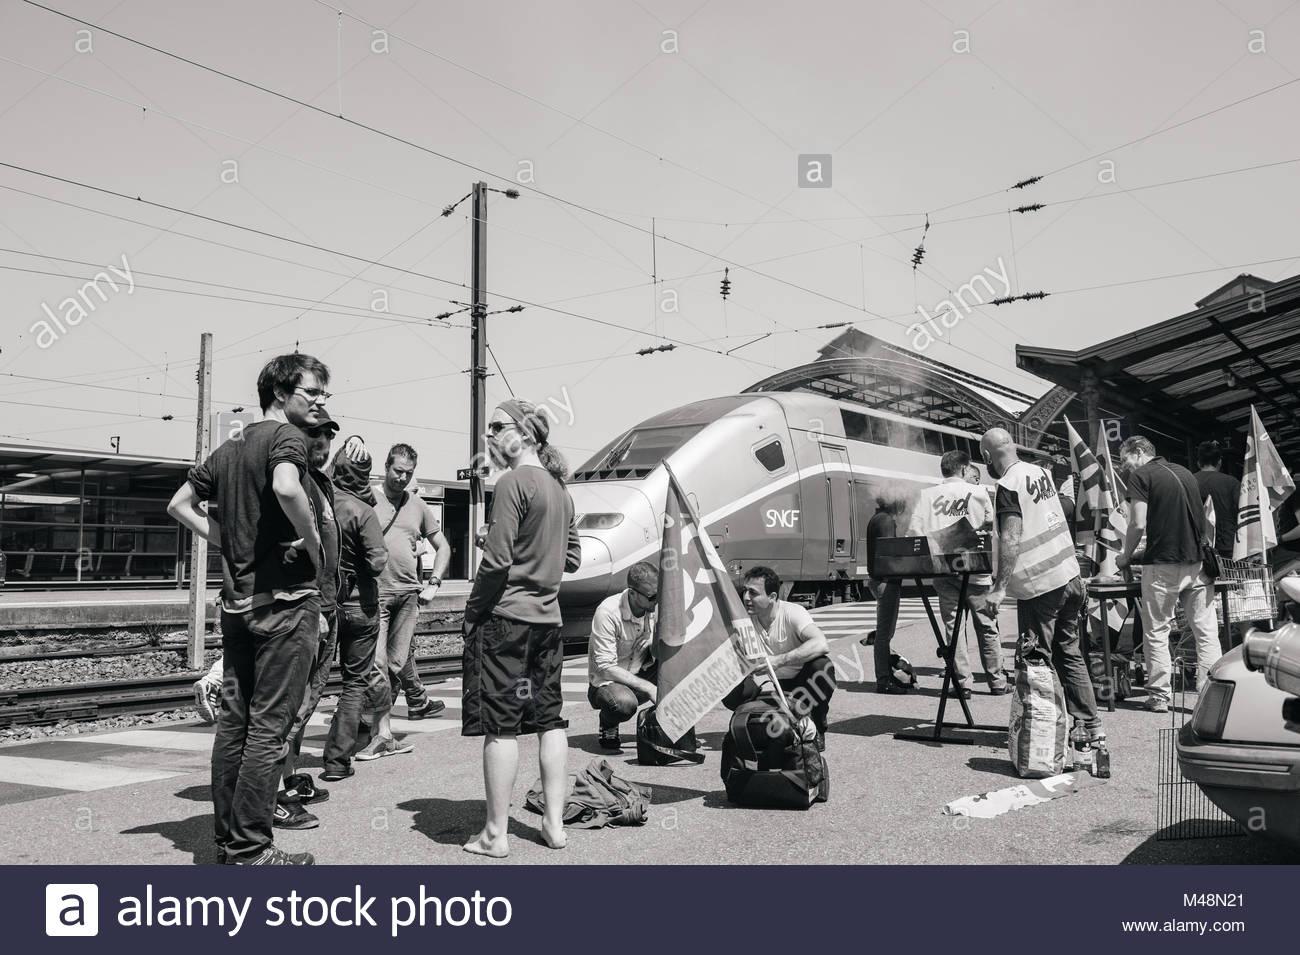 Französische Staatsbahn SNCF Streik-Demonstrant, Grill Stockbild